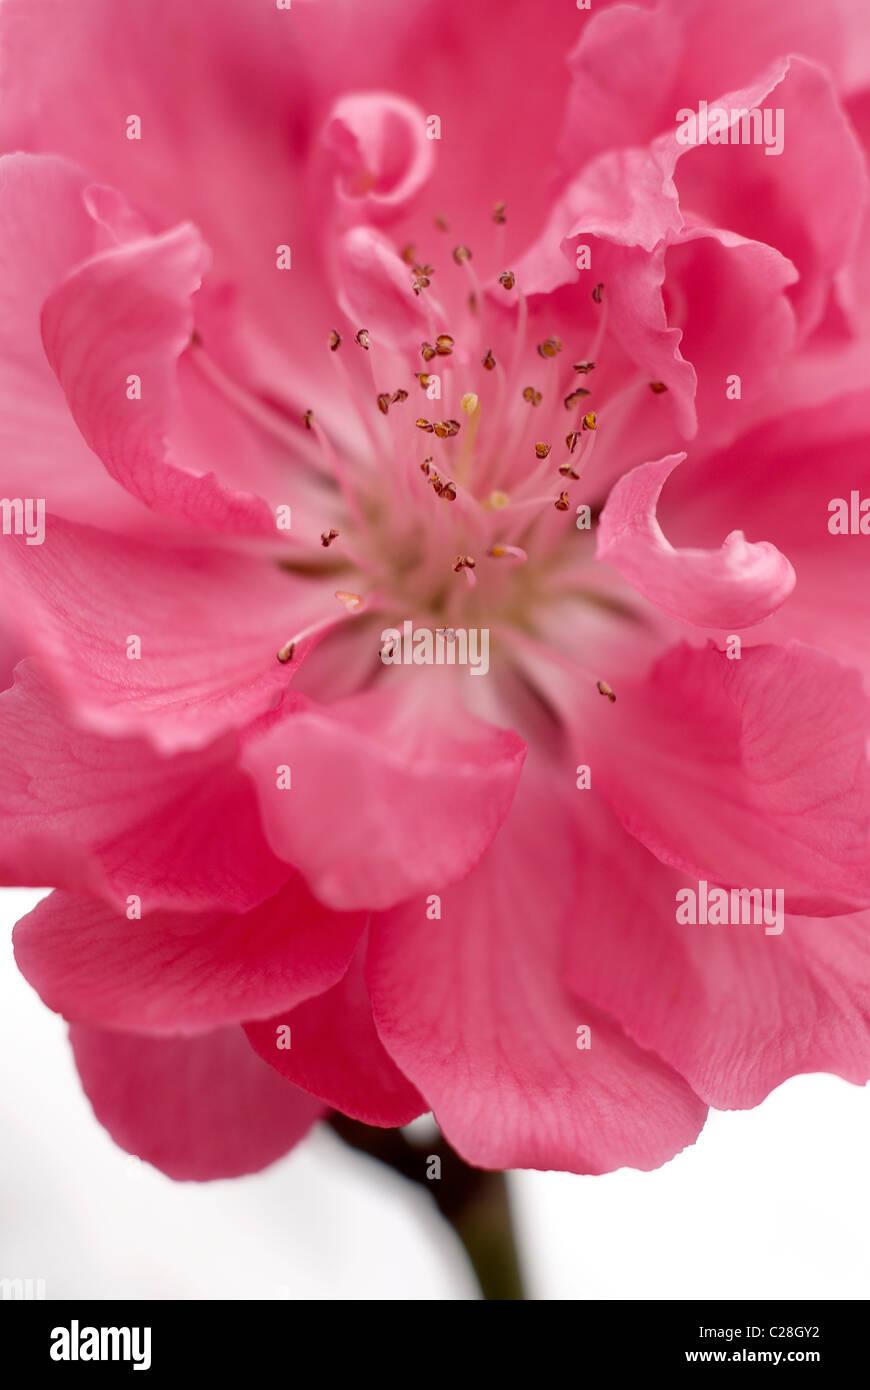 Ornamental peach blossom - Stock Image